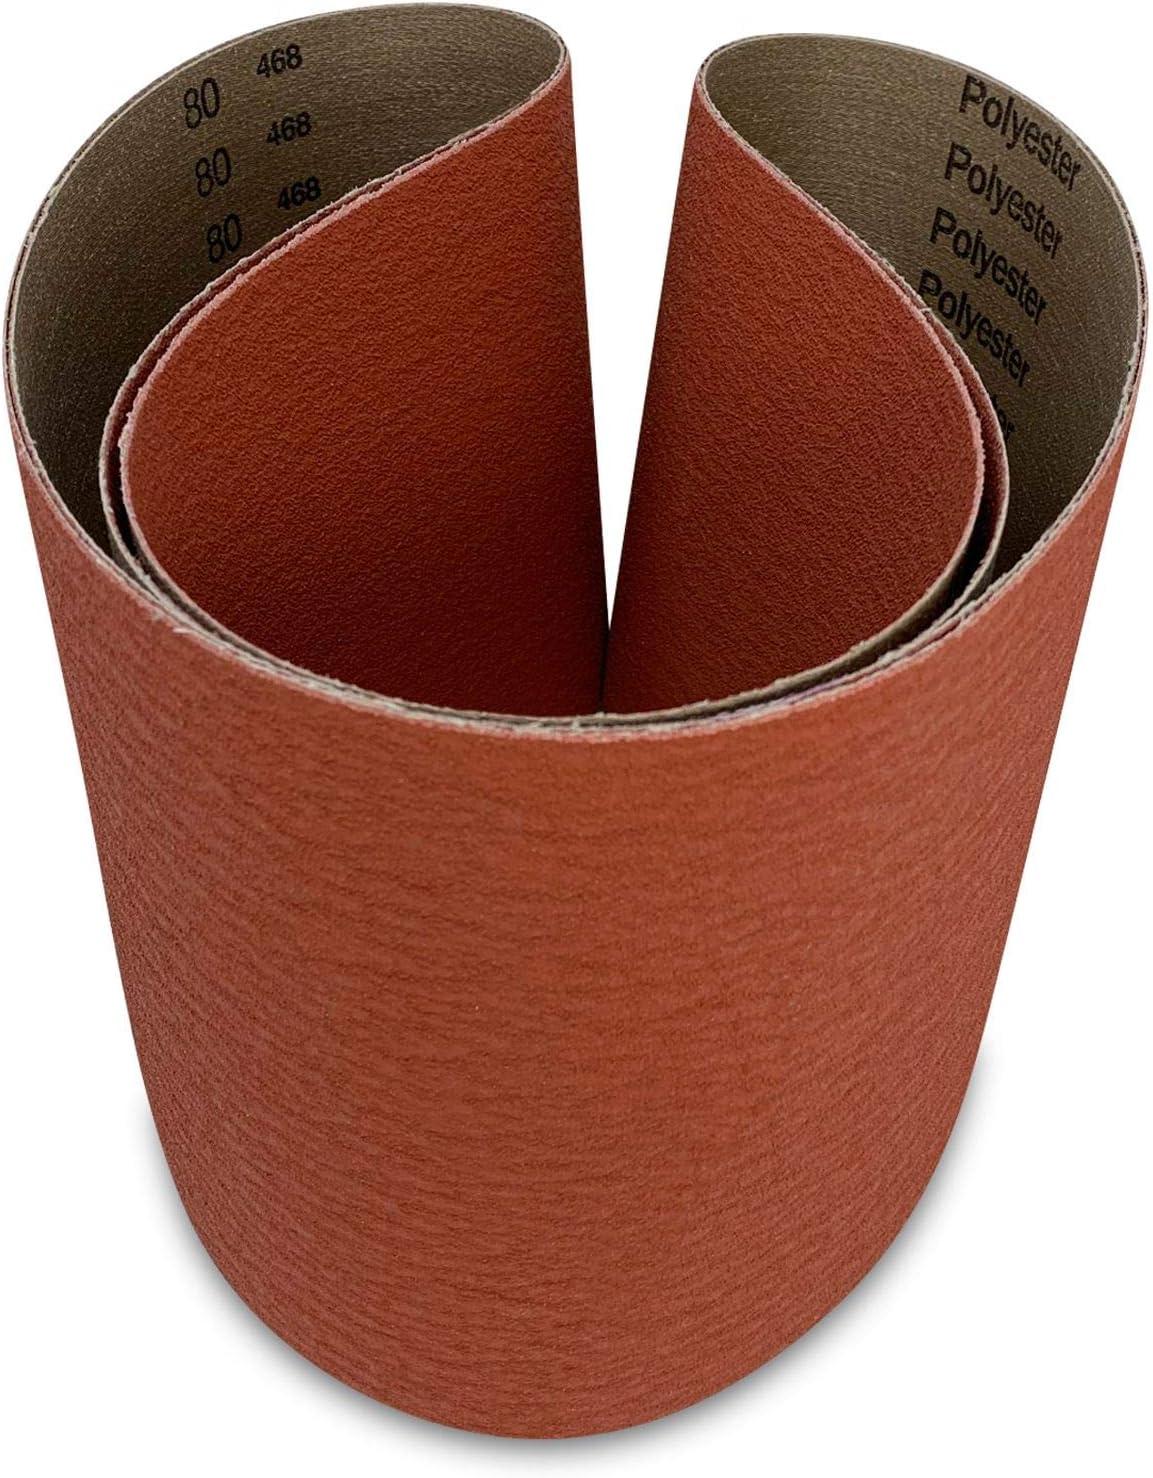 2 x 48 Inch Hig Quality A//Z-Zirc Sanding Belts  120 Grit 3pcs